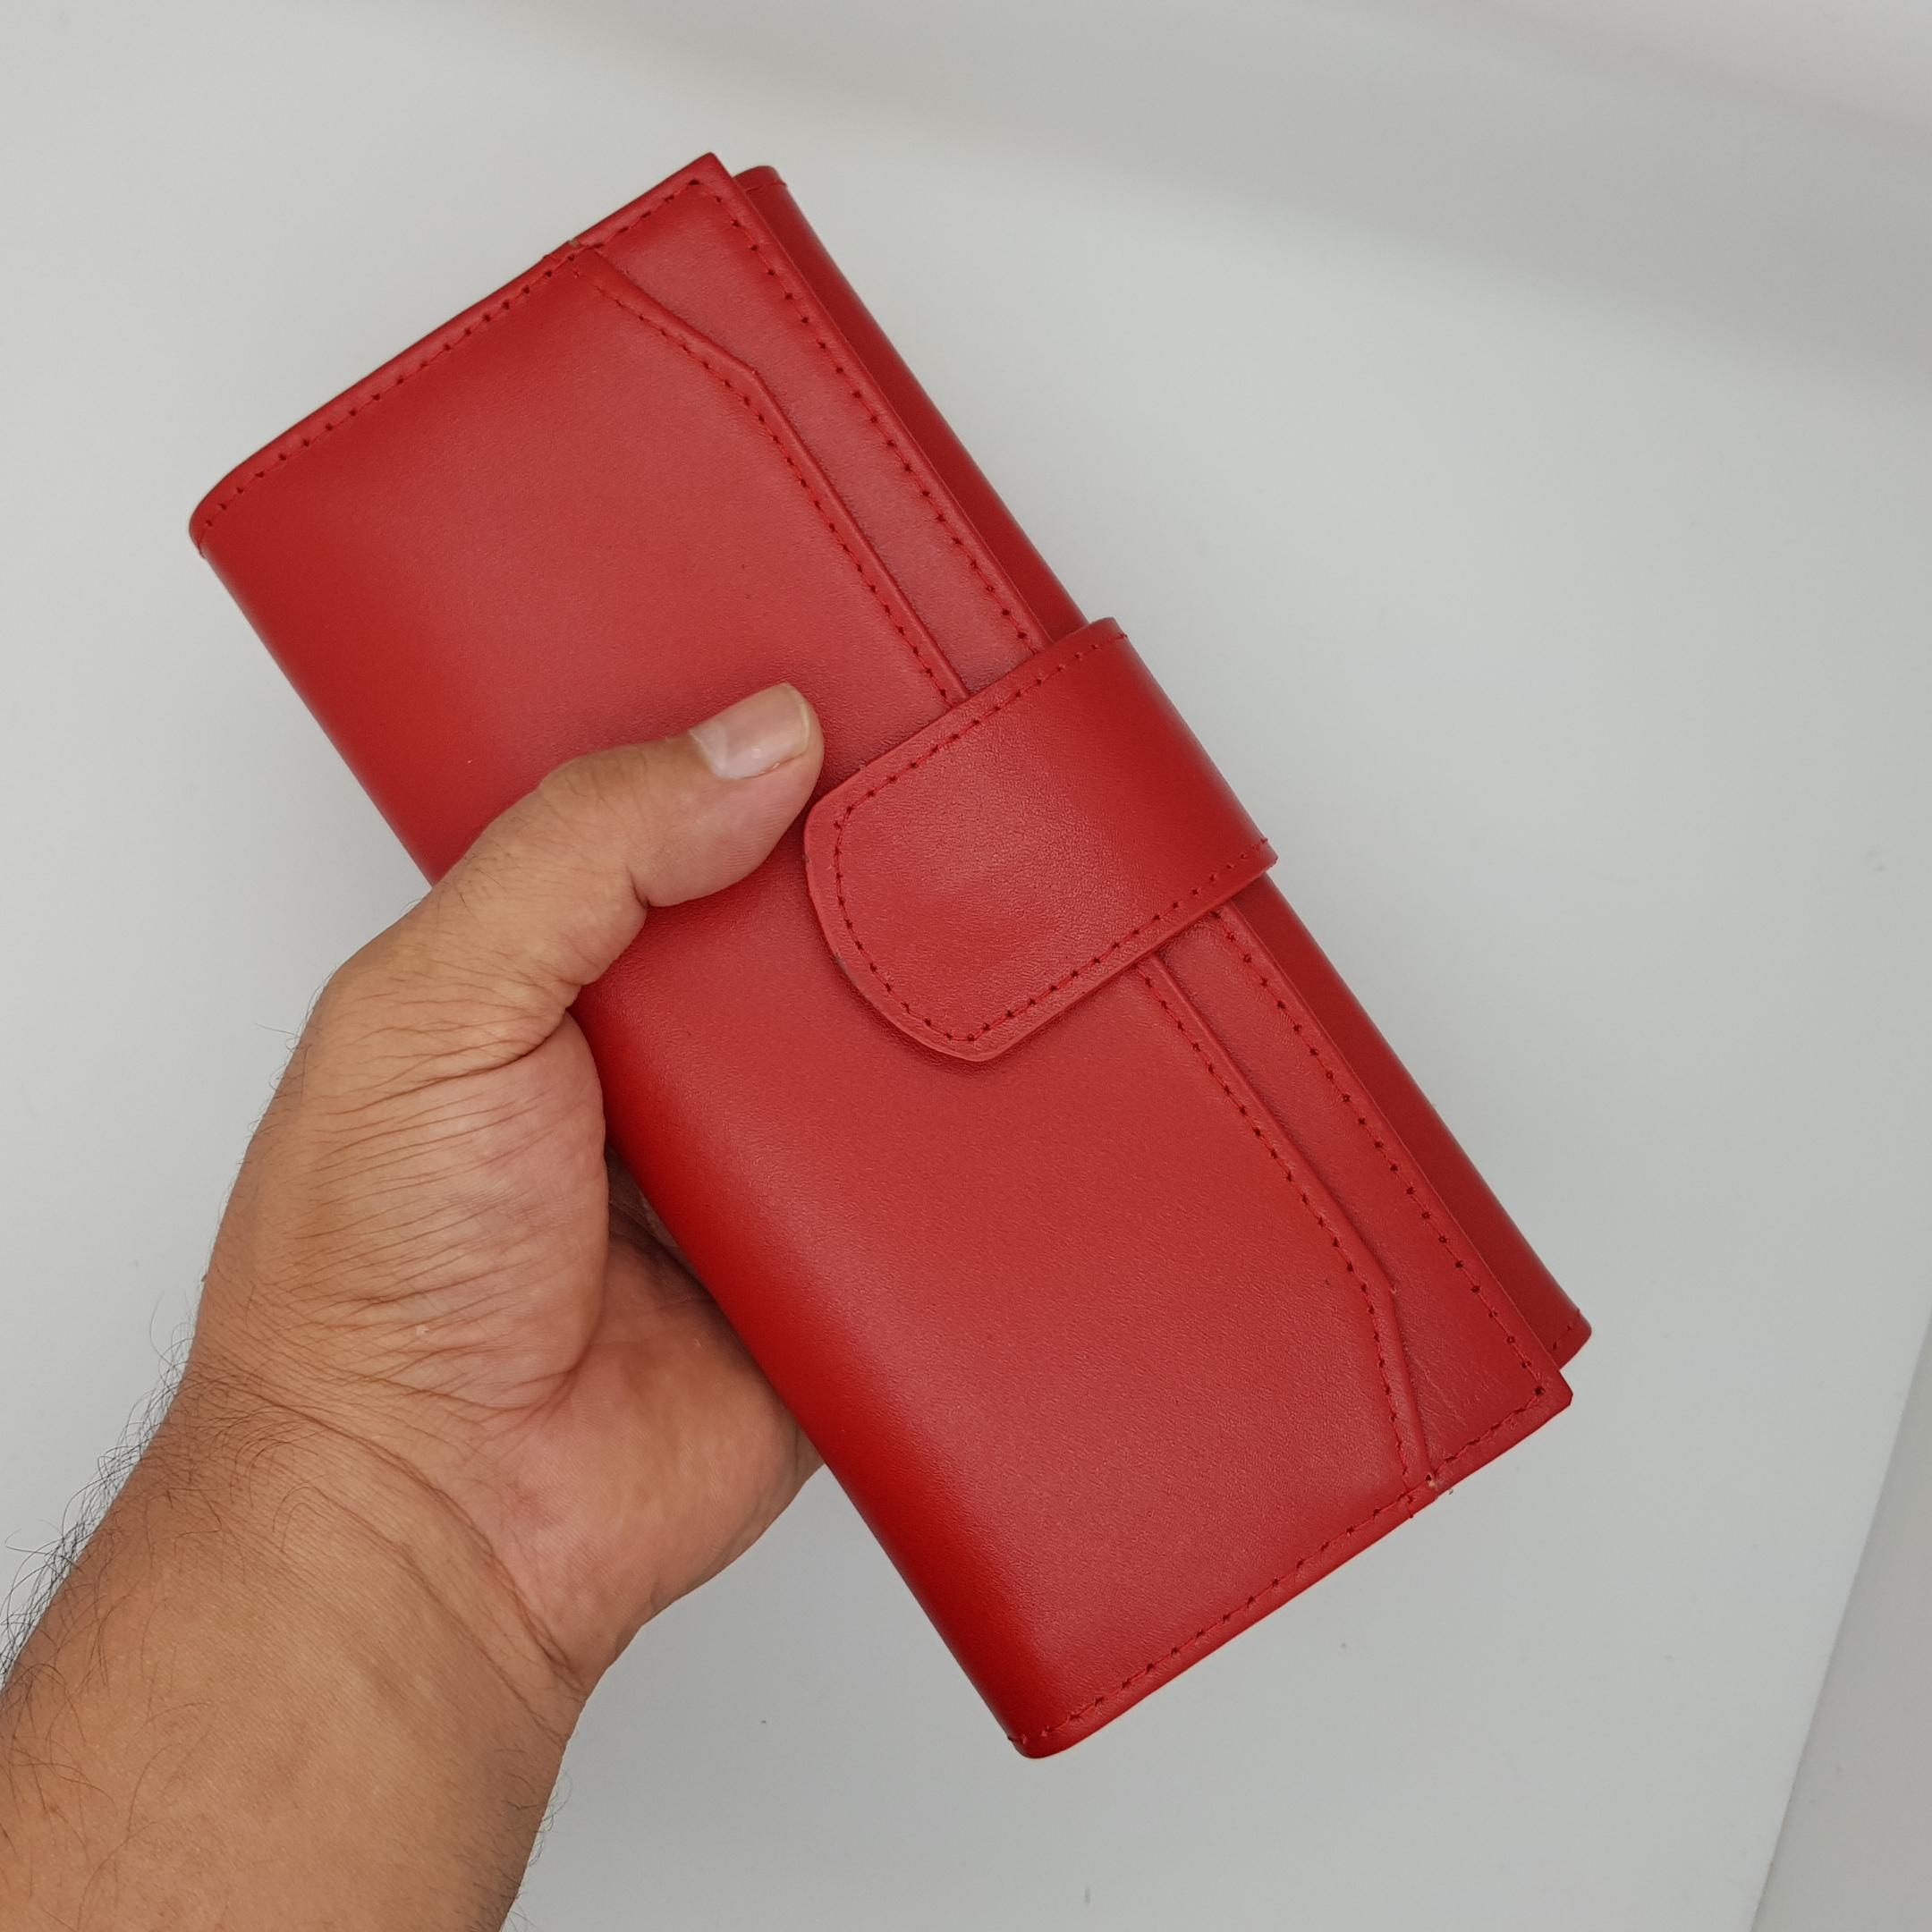 کیف پول زنانه چرم دیاکو مدل 315 -  - 13